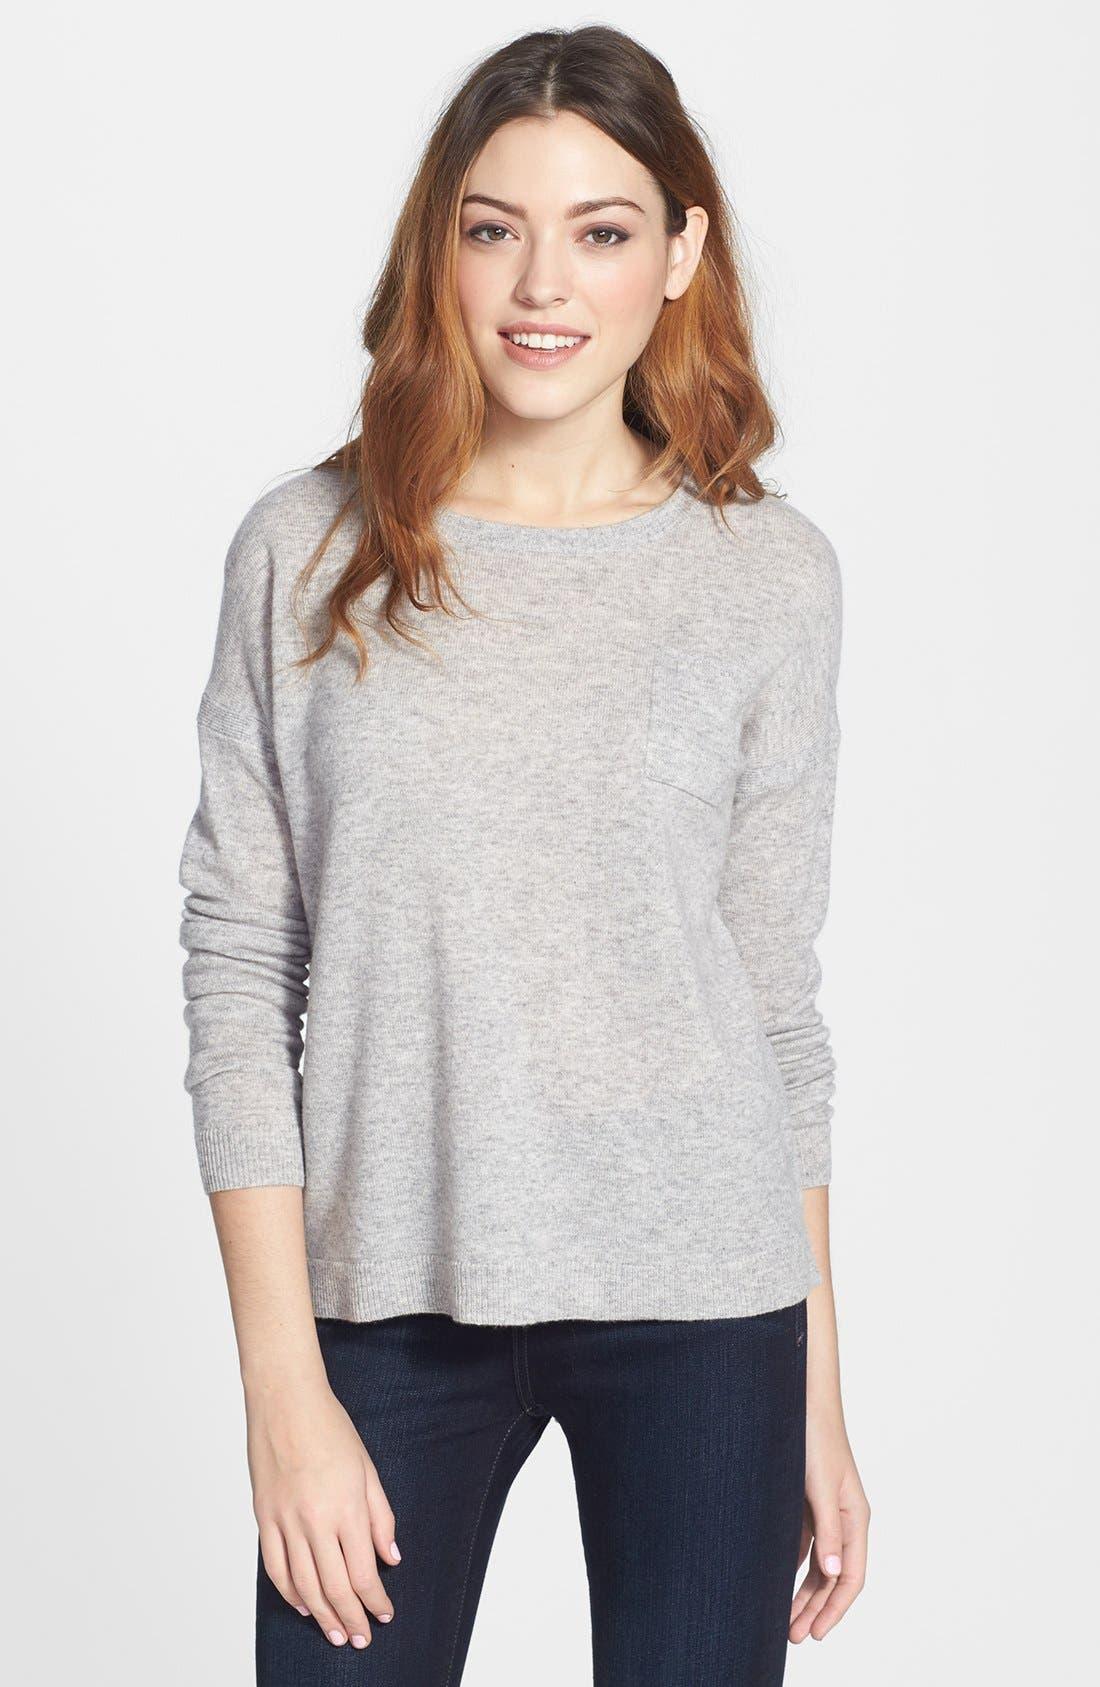 Main Image - Halogen® Lightweight Cashmere Crewneck Sweater with Pocket (Petite)